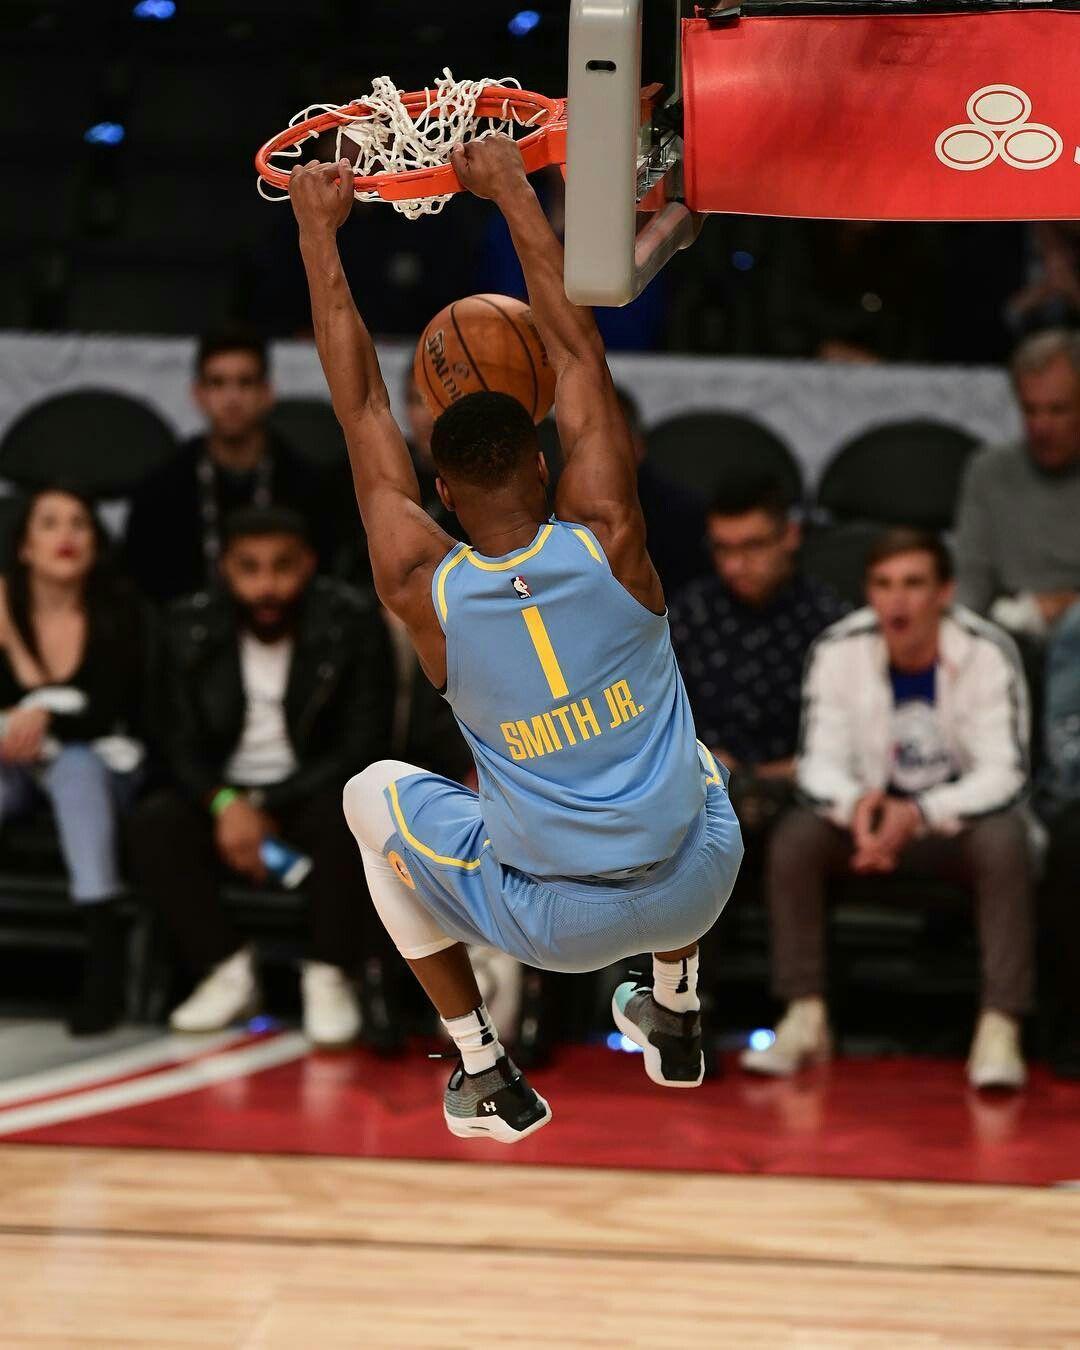 Basquete de Shawn Gordon em 2019 NBA All Star